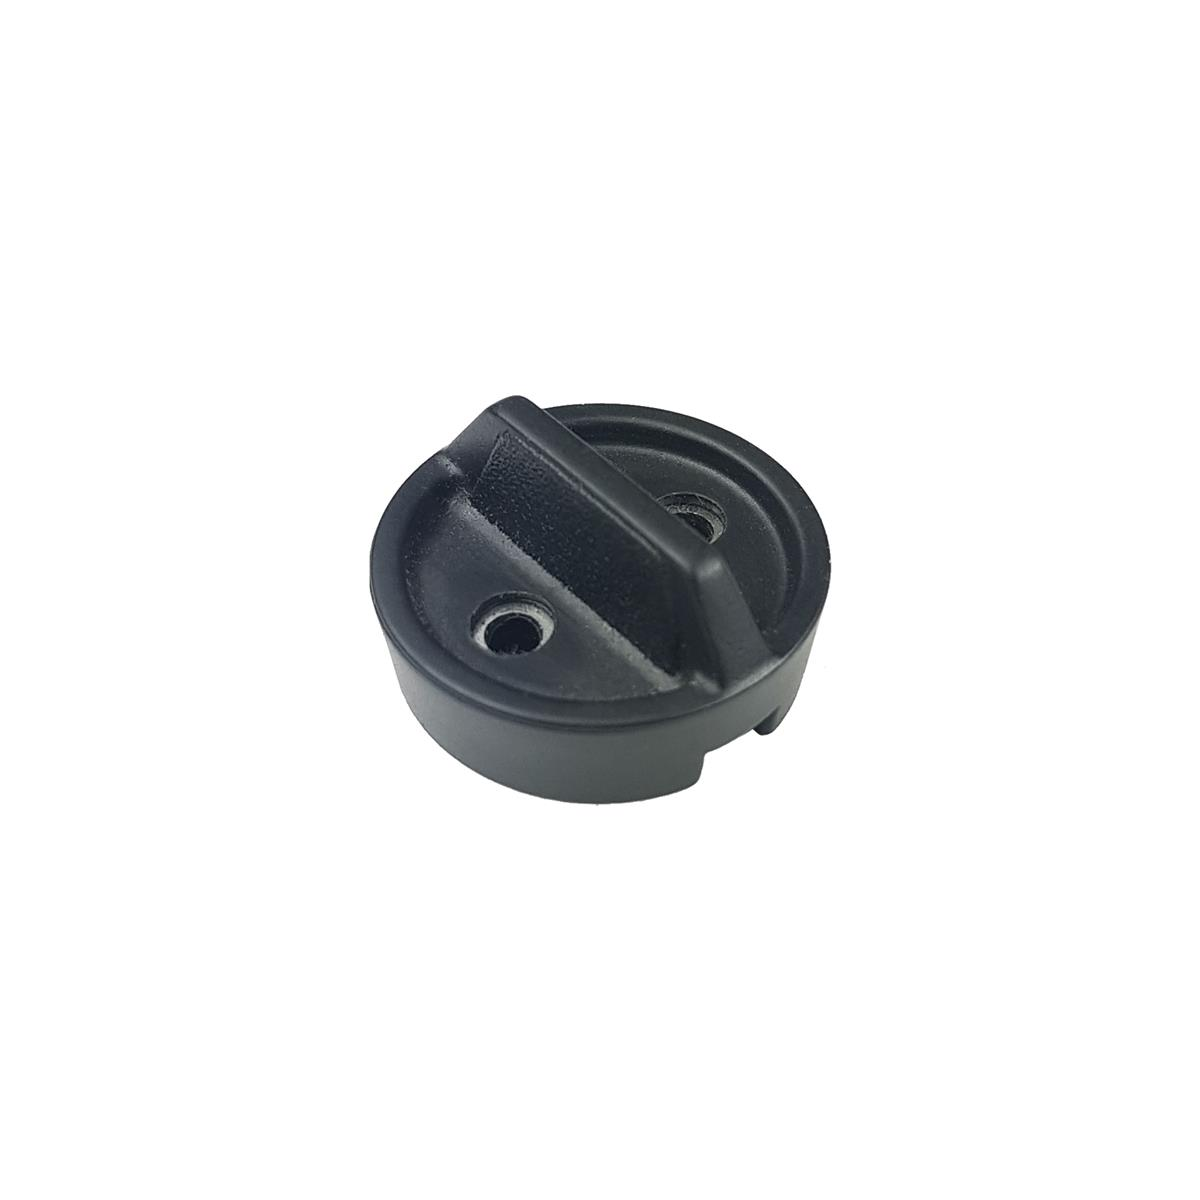 Magnetic battery cap for JAM2, SAM2 and BOLD2 models Shimano engine